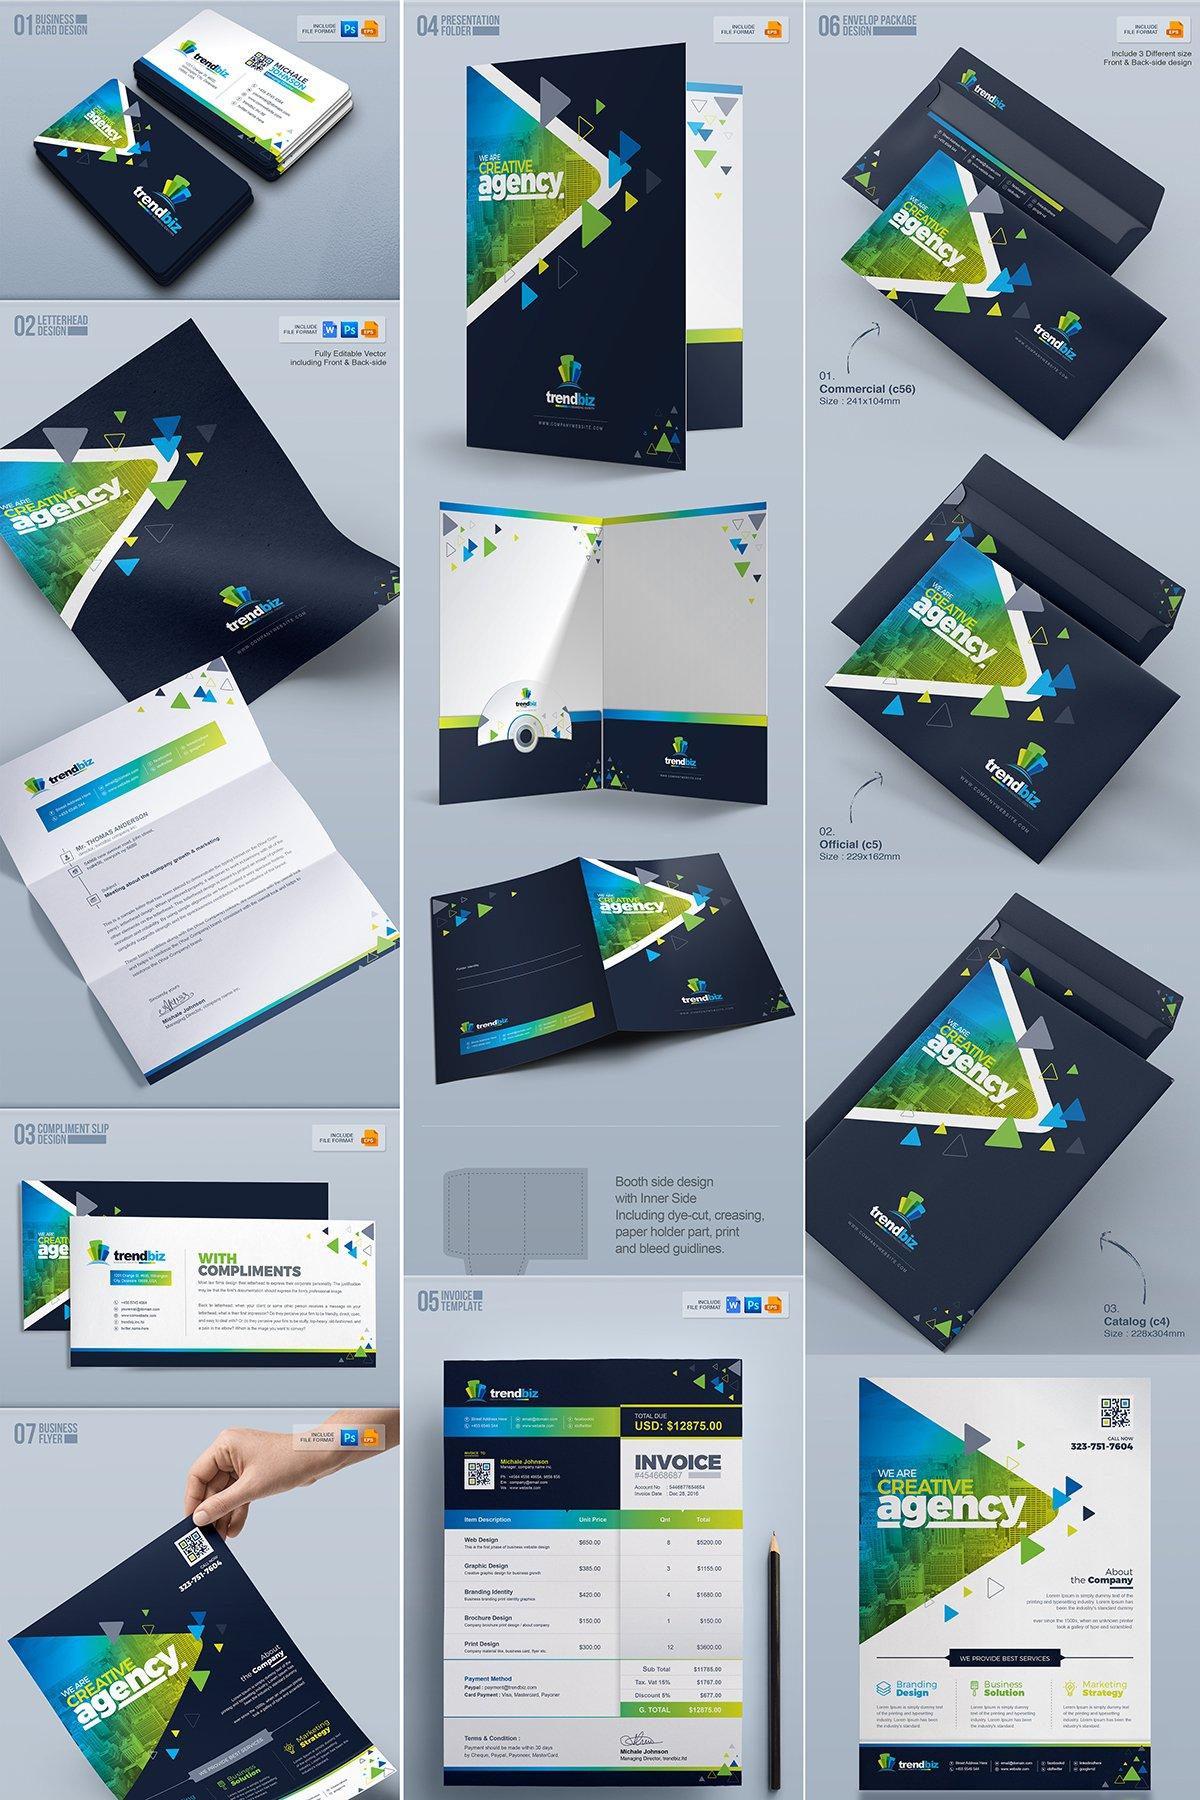 Stationery Branding Identity Bundle - $39 - 02 Business mega stationery branding identity design